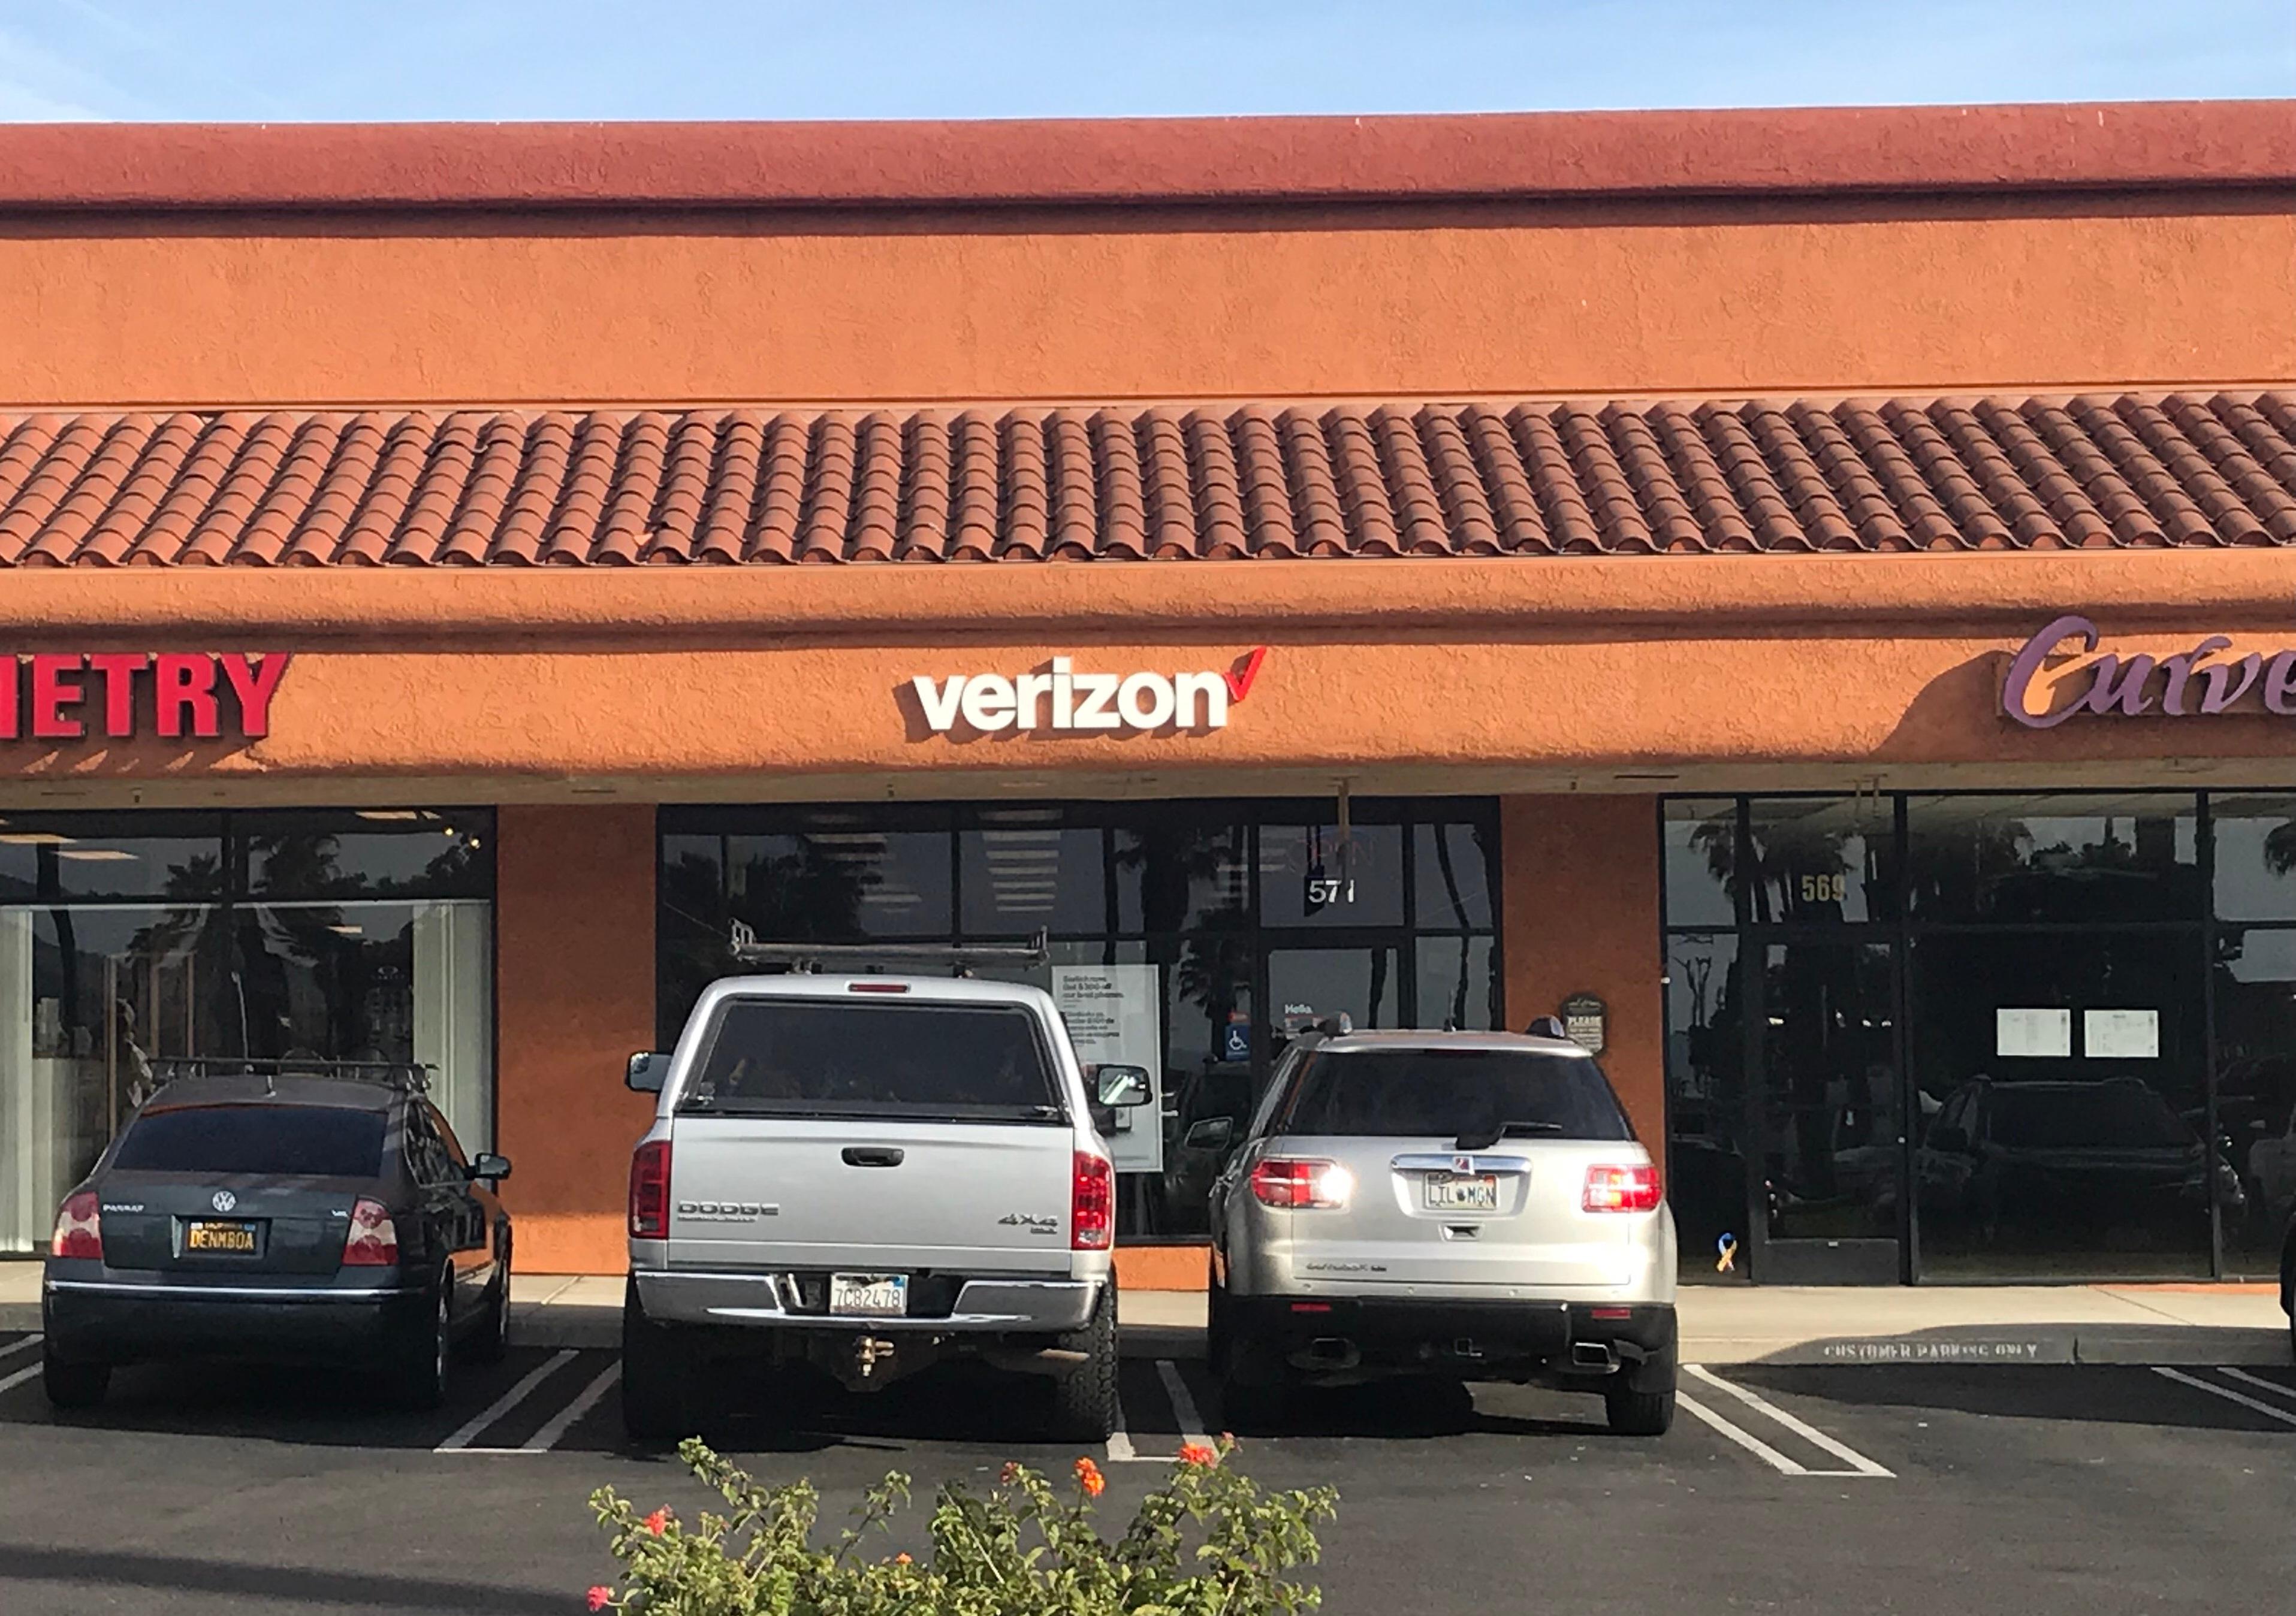 Verizon Authorized Retailer – GoWireless - CLOSED image 4